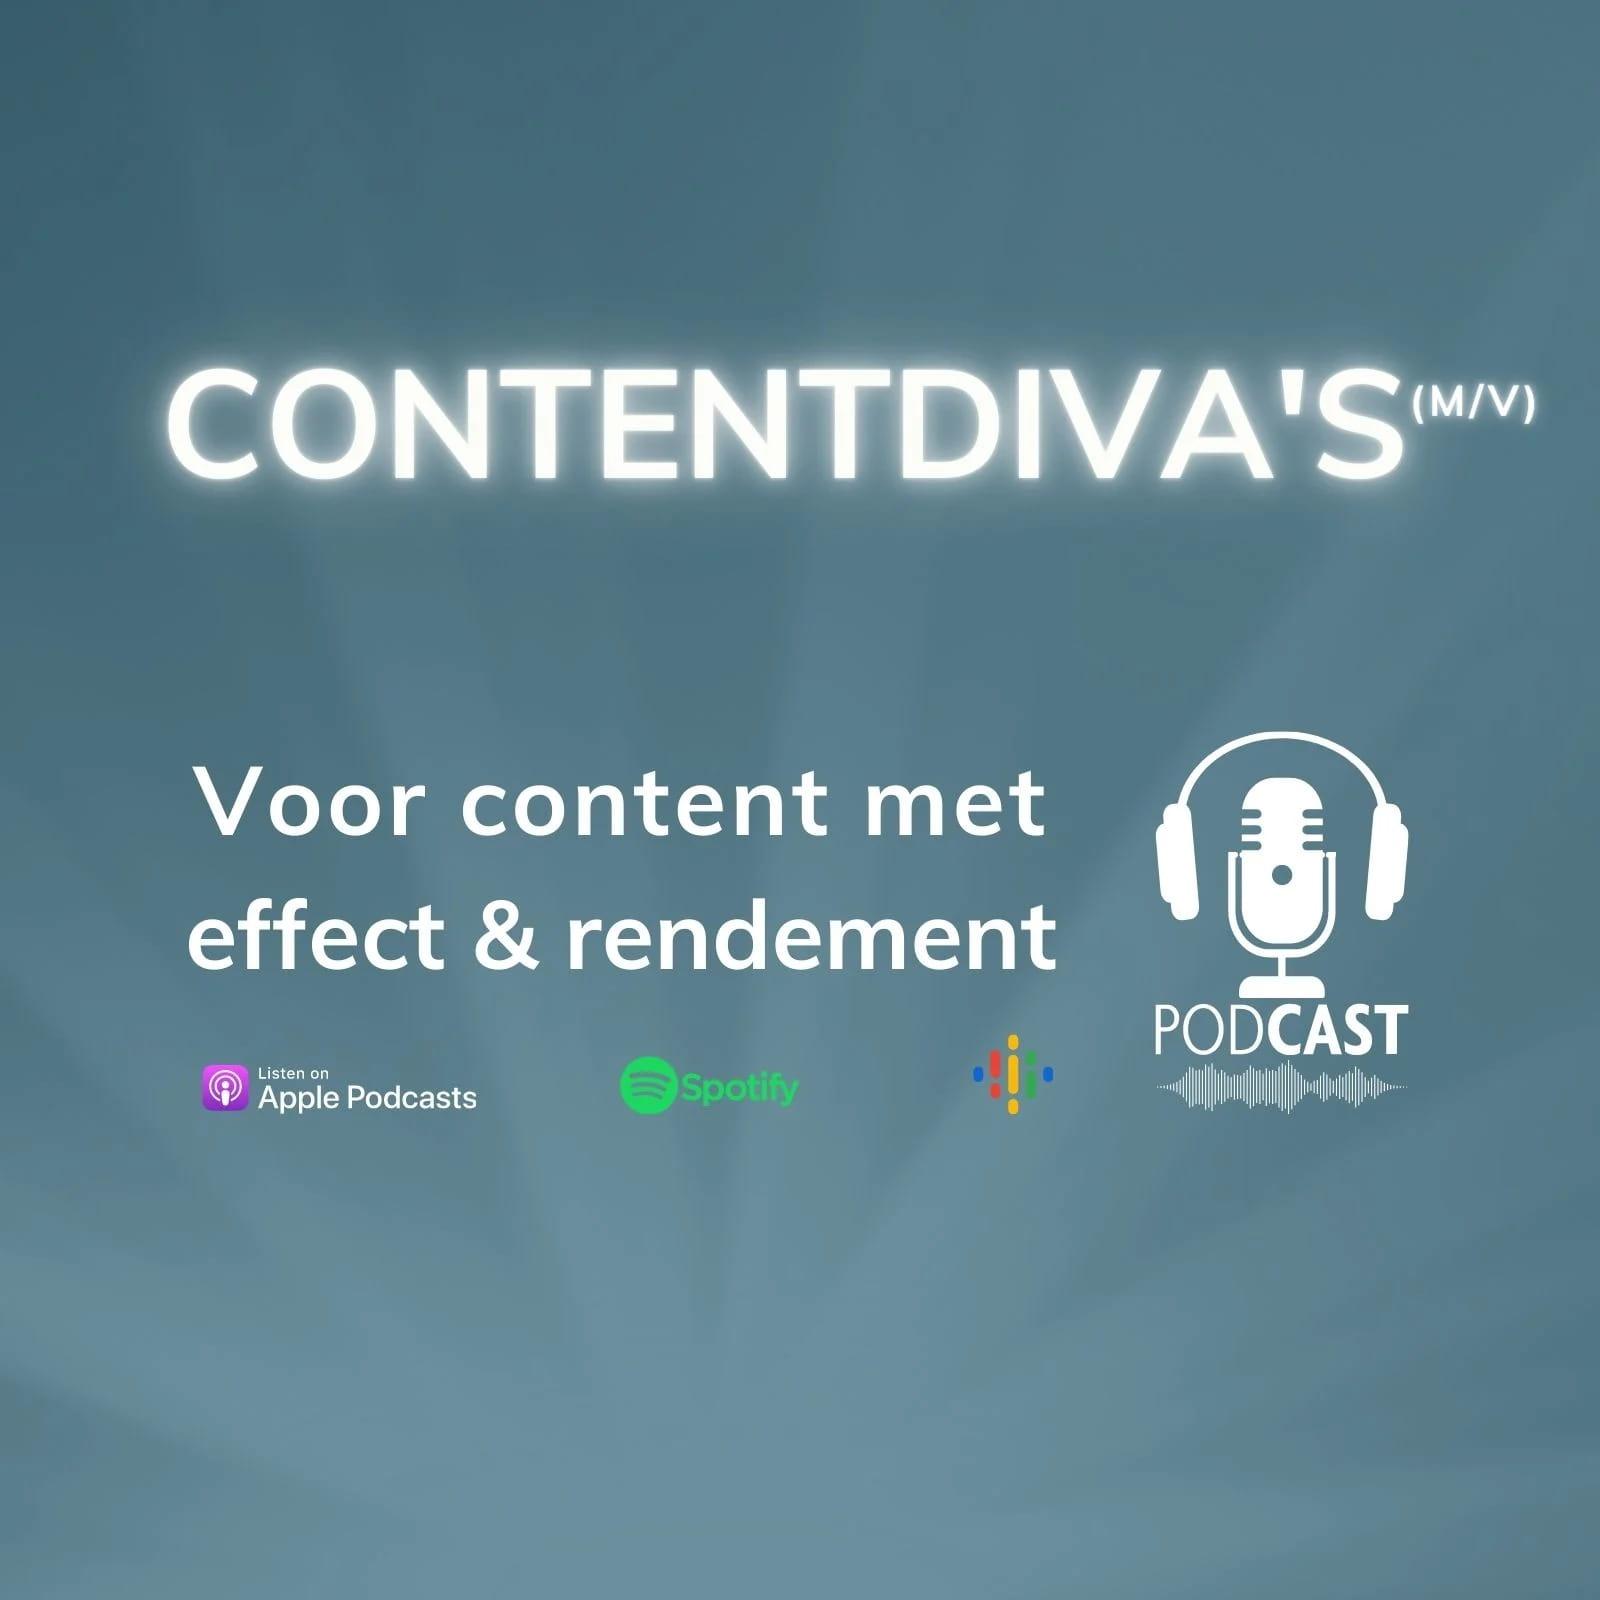 marketingpodcast Contentdiva's